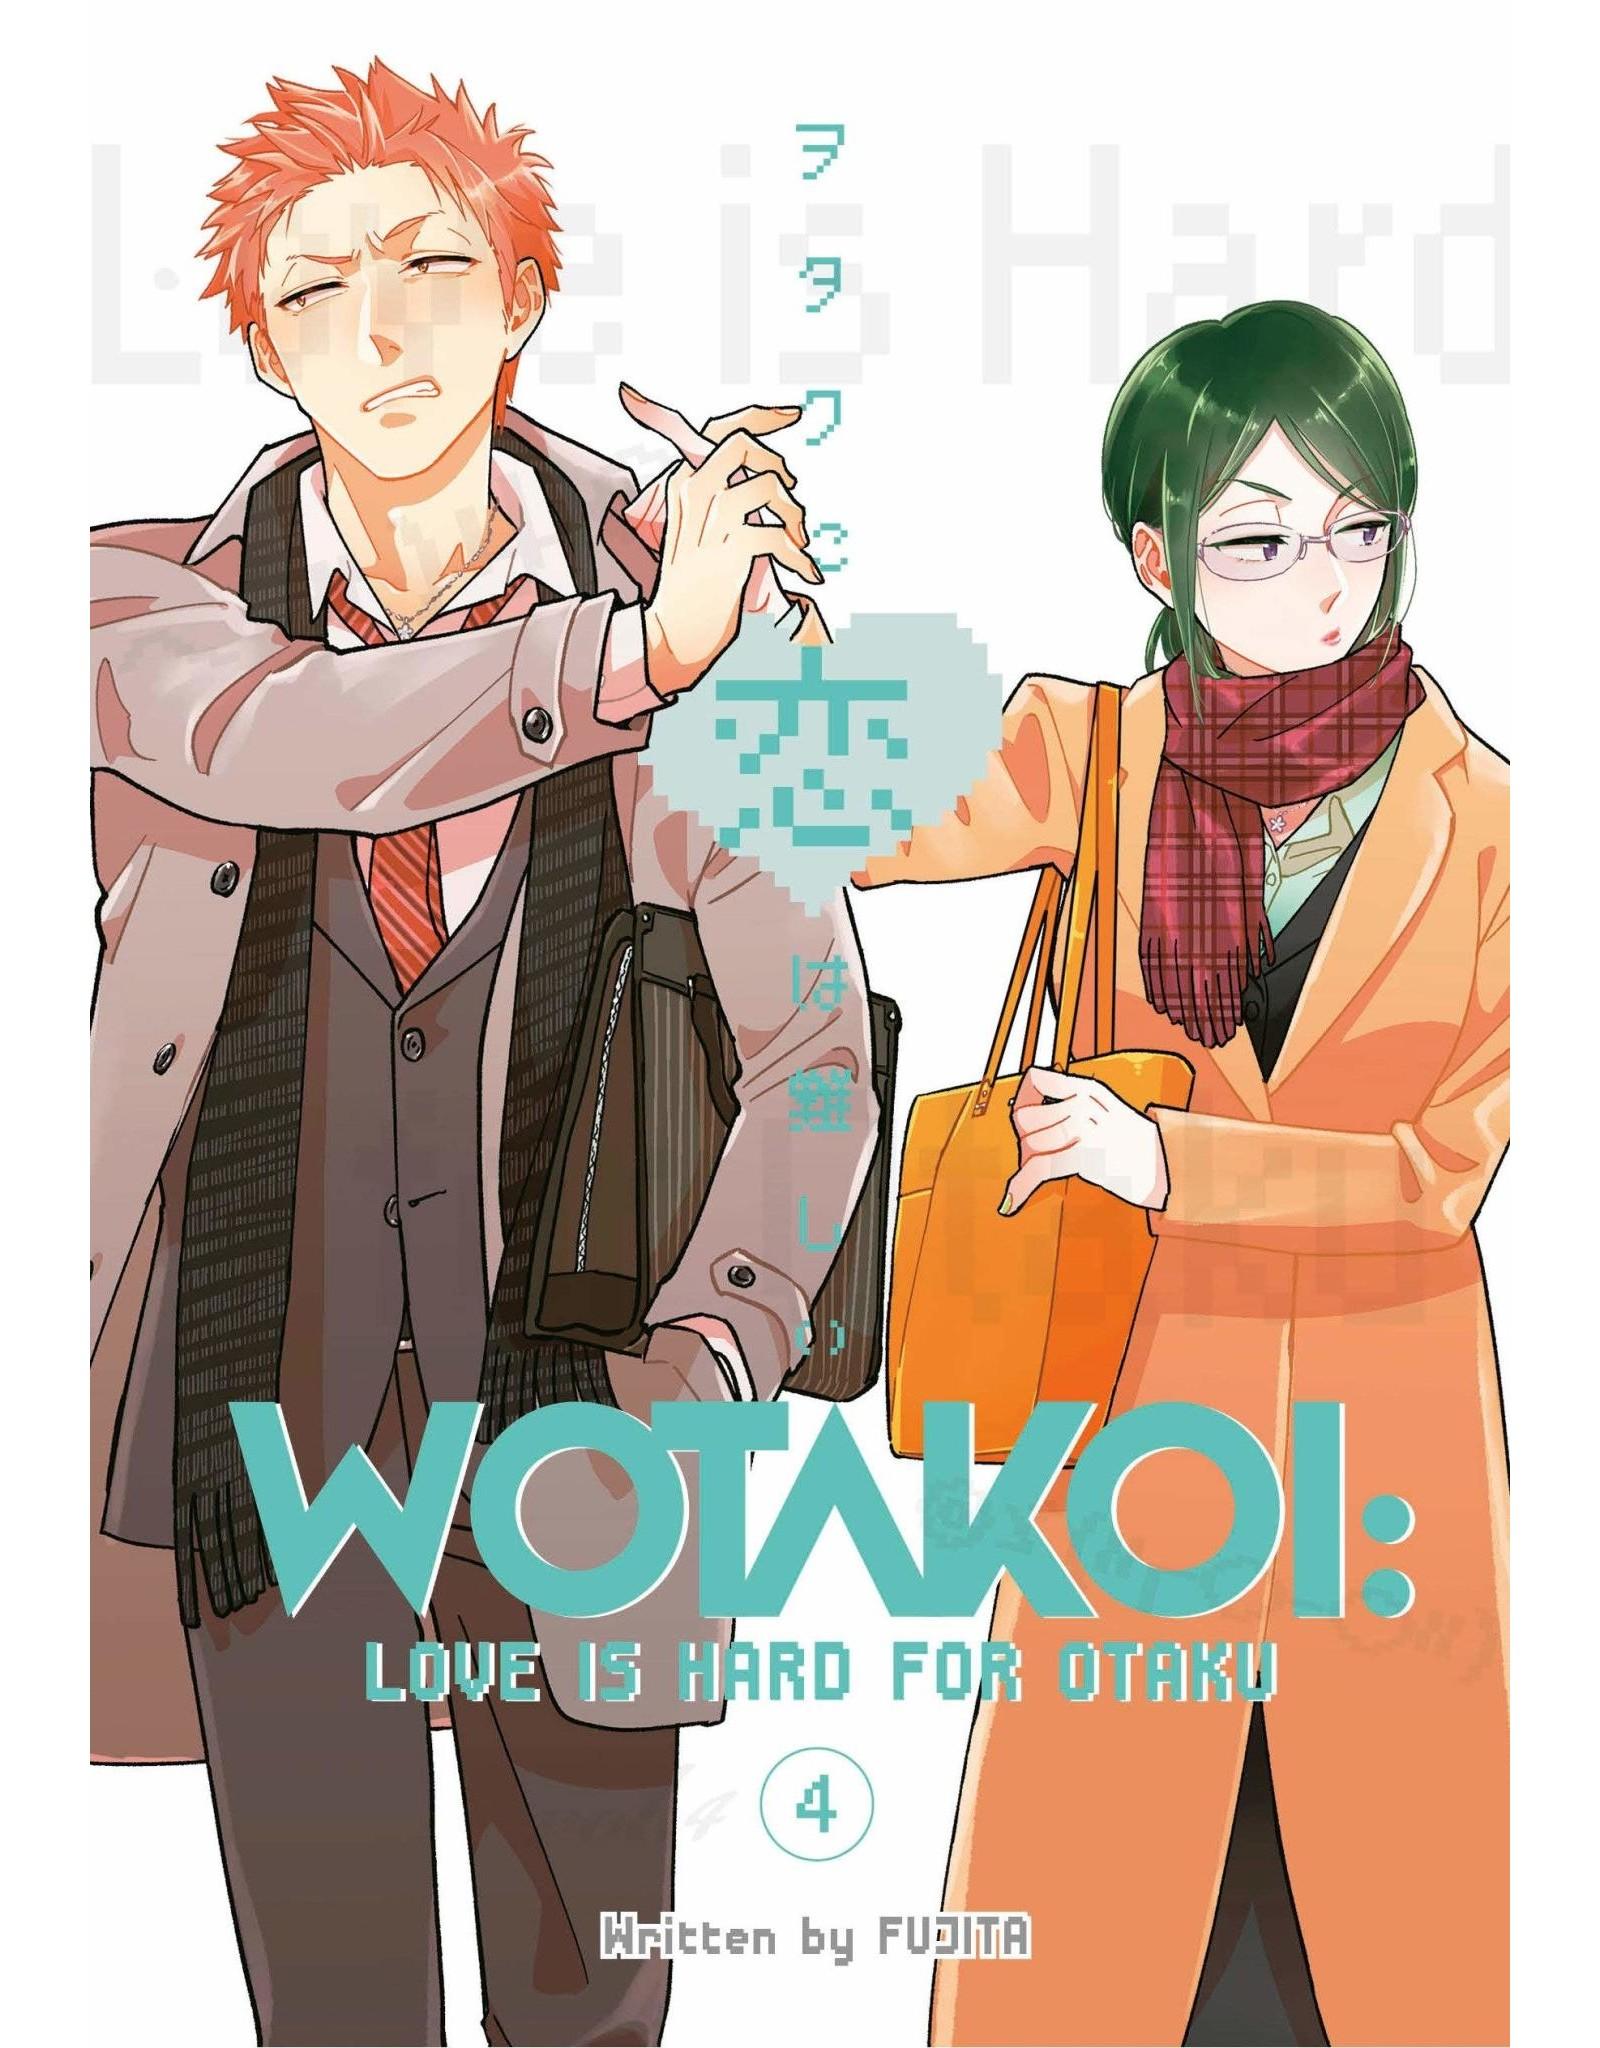 Wotakoi: Love is Hard for Otaku 4 (Engelstalig)